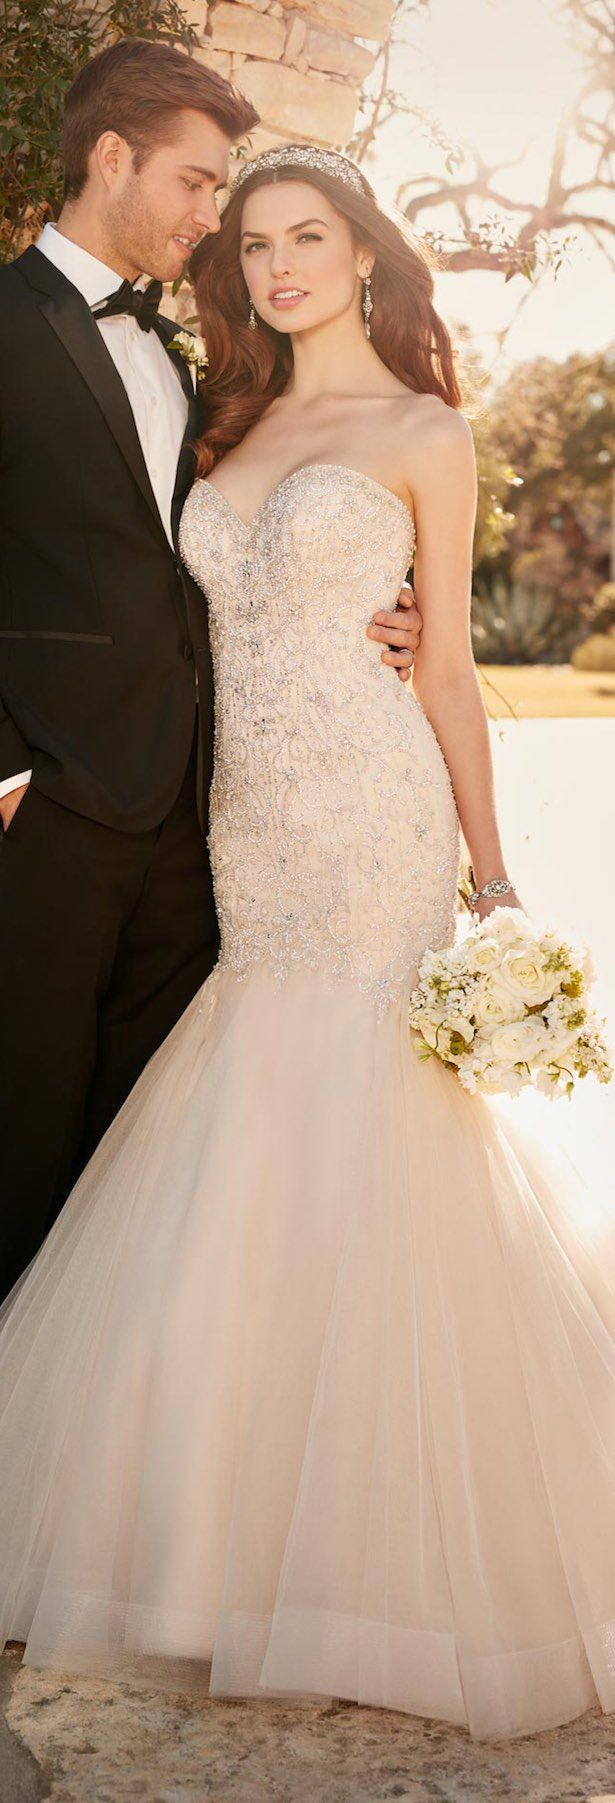 Wedding Dresses:   Illustration   Description   Essense of Australia Fall 2016 Wedding Dress    -Read More –   - #WeddingDresses https://adlmag.net/2018/01/02/wedding-dresses-inspiration-essense-of-australia-fall-2016-wedding-dress-34/